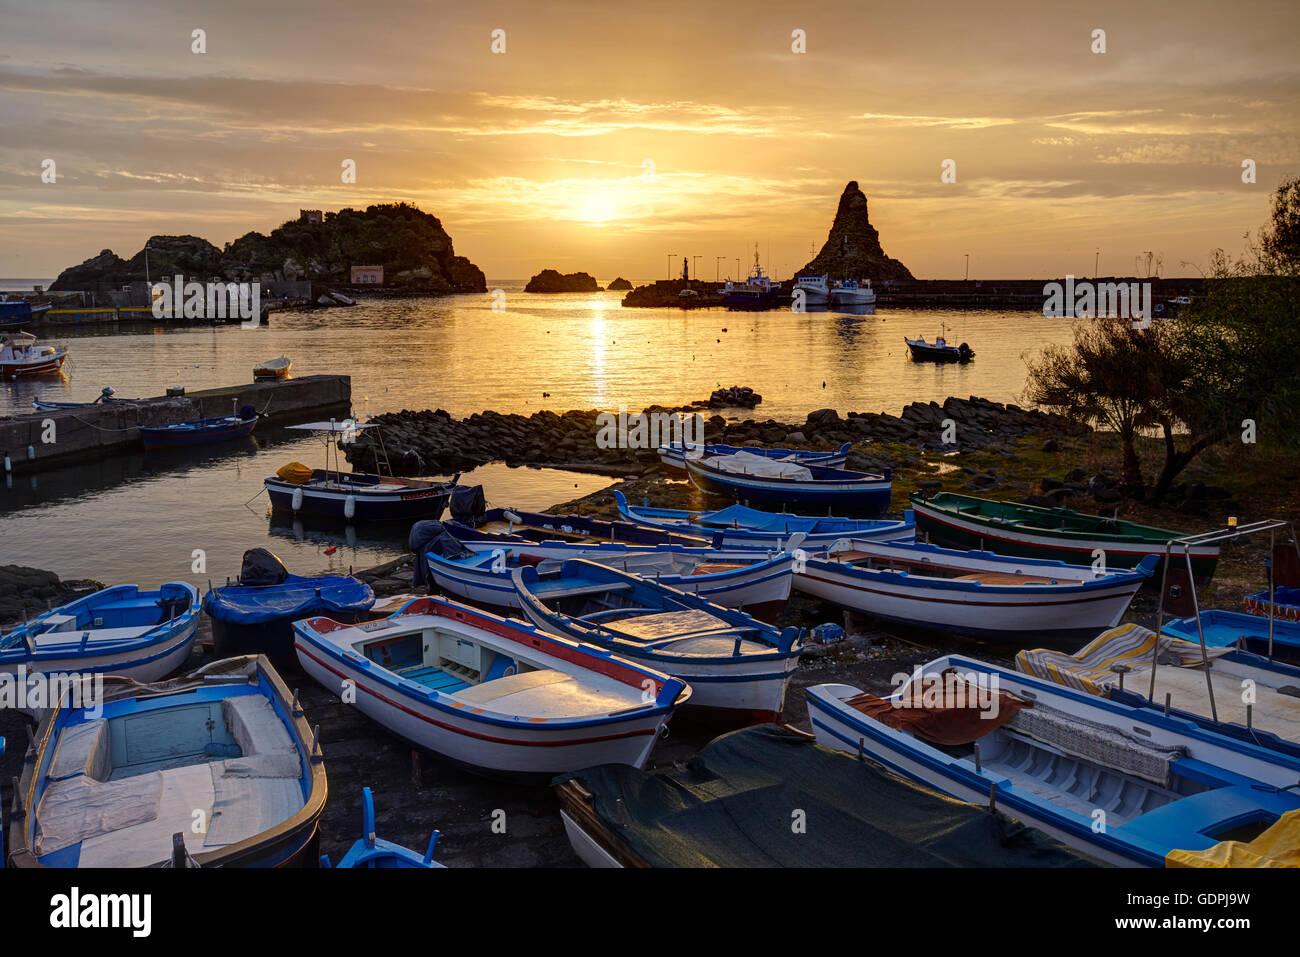 The little port of Aci Trezza, Sicily, Italy - Stock Image